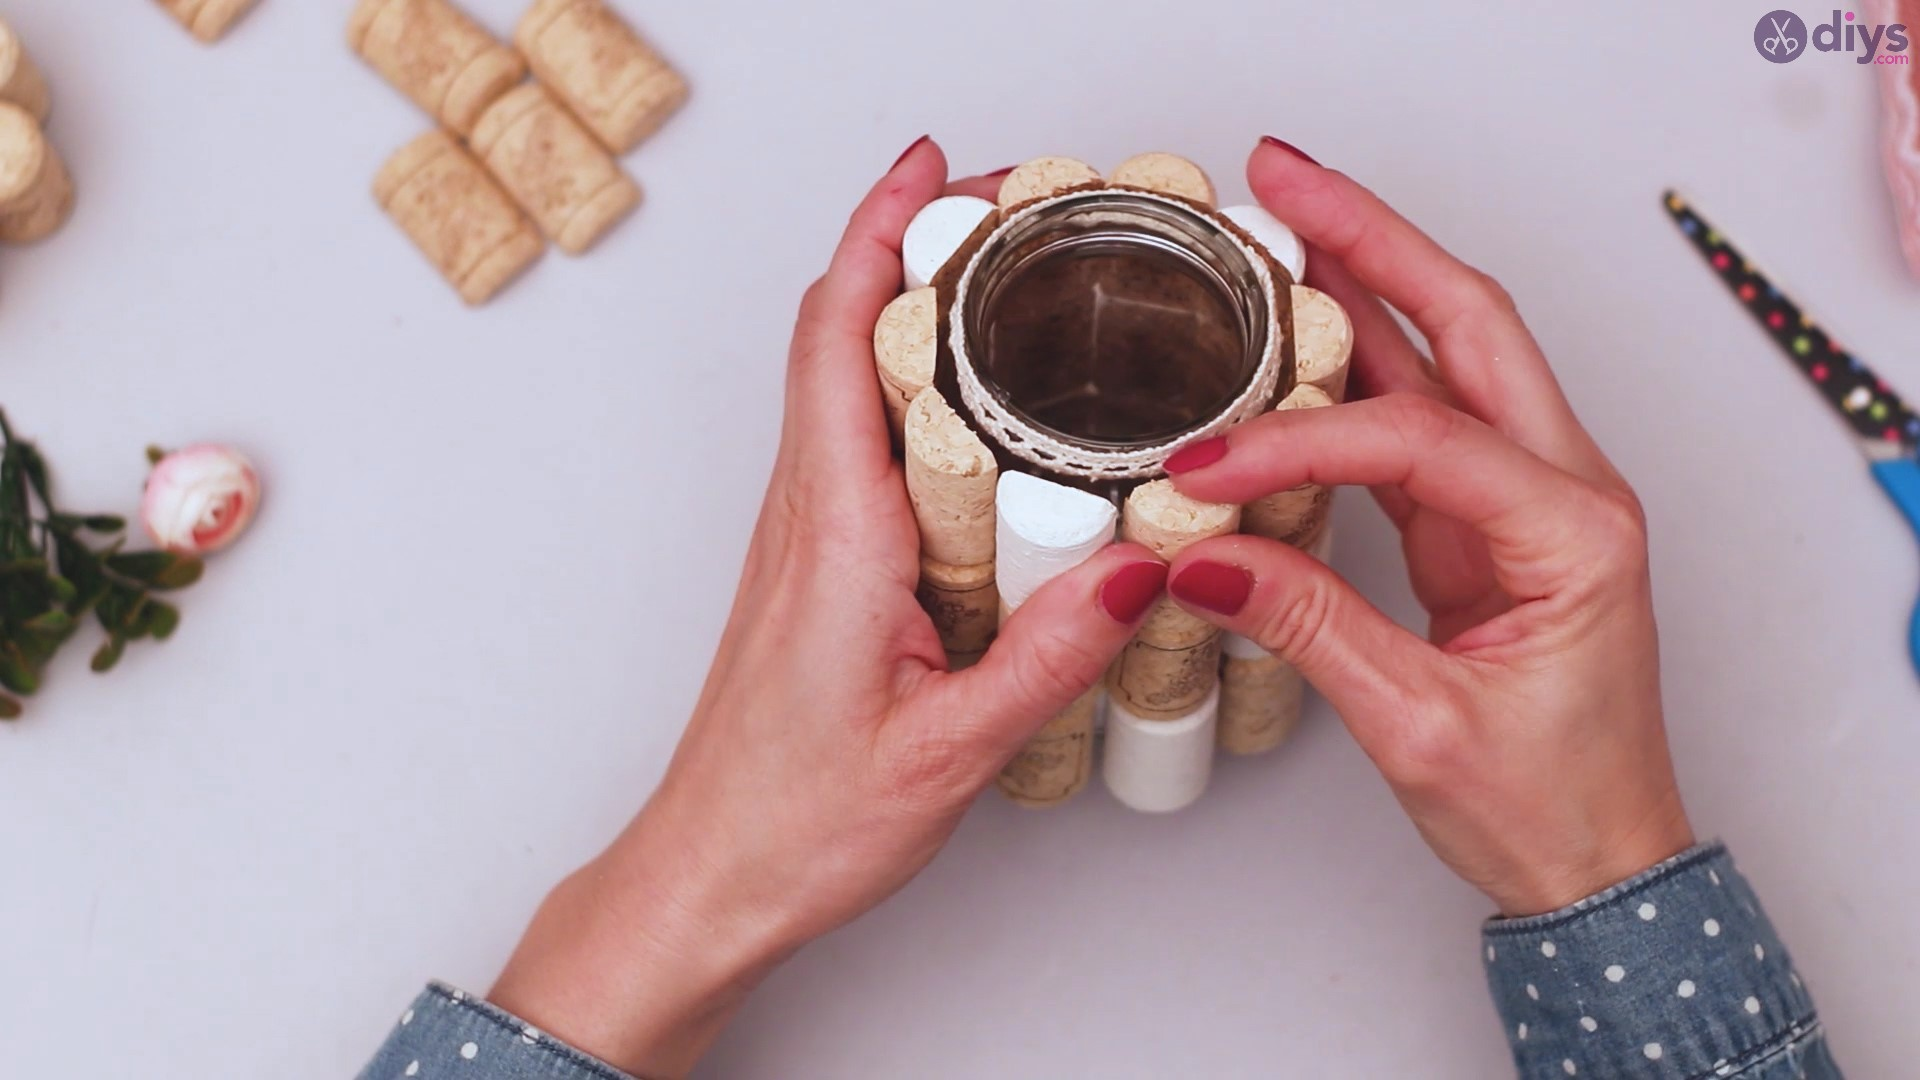 Diy wine cork flower vase (27)